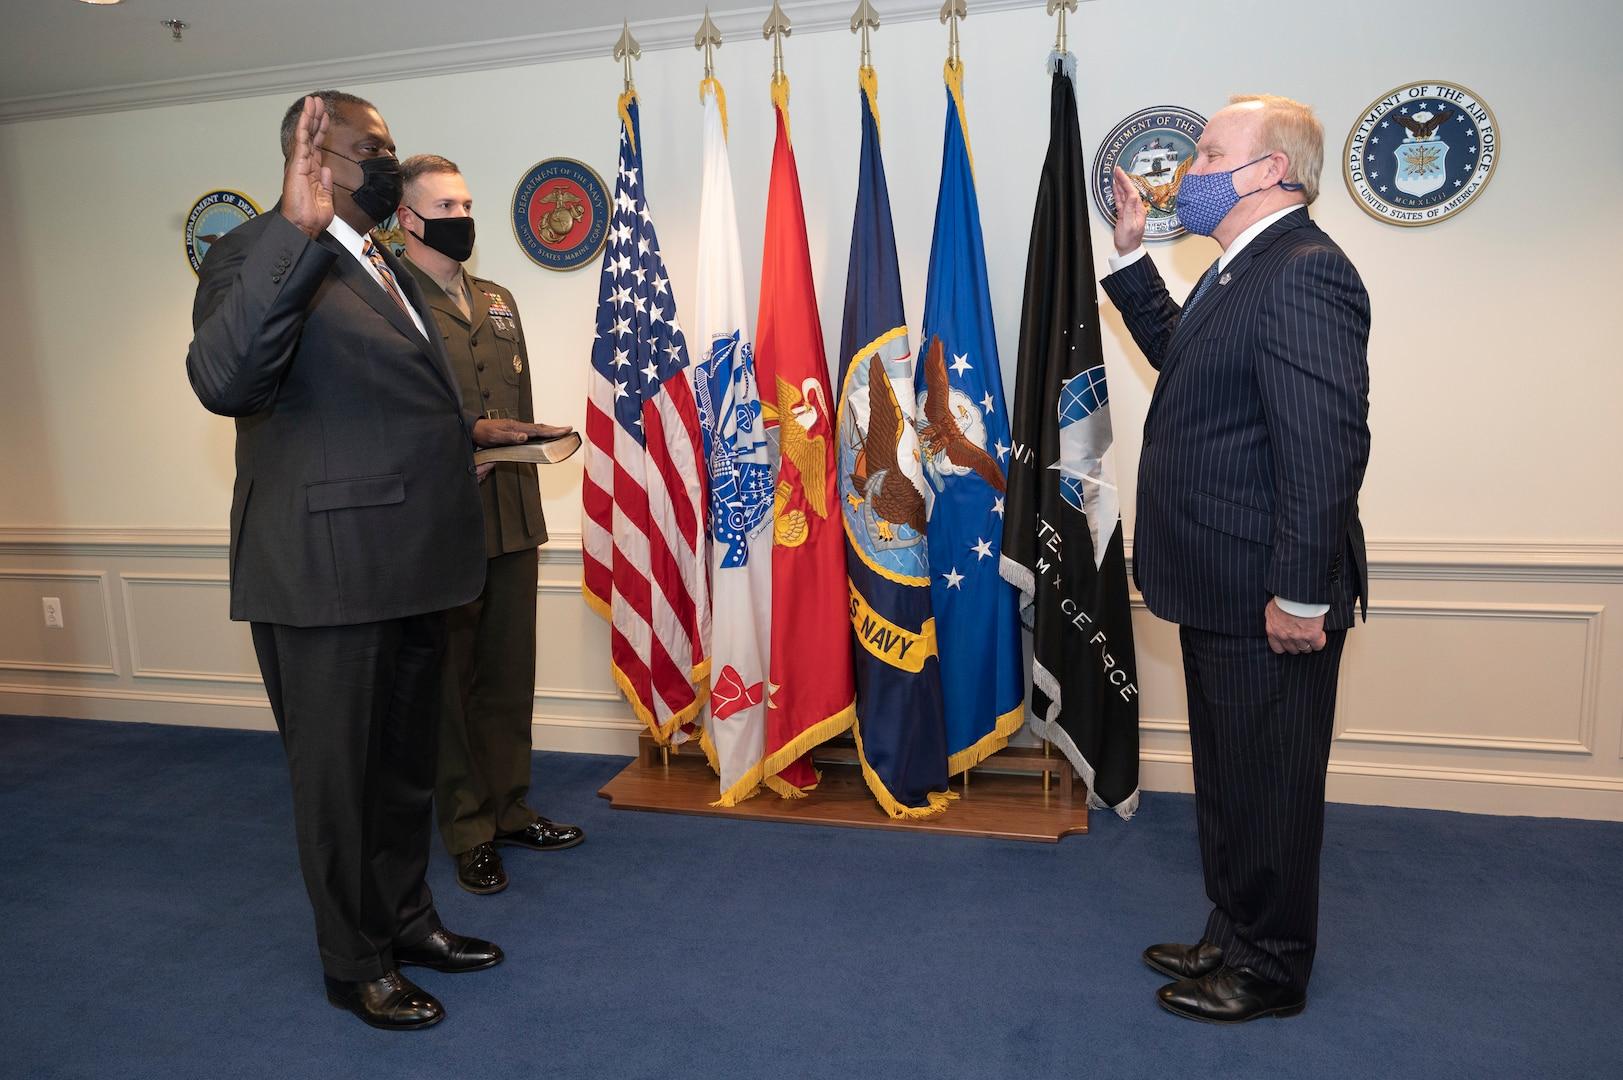 Lloyd J. Austin III as secretary of defense